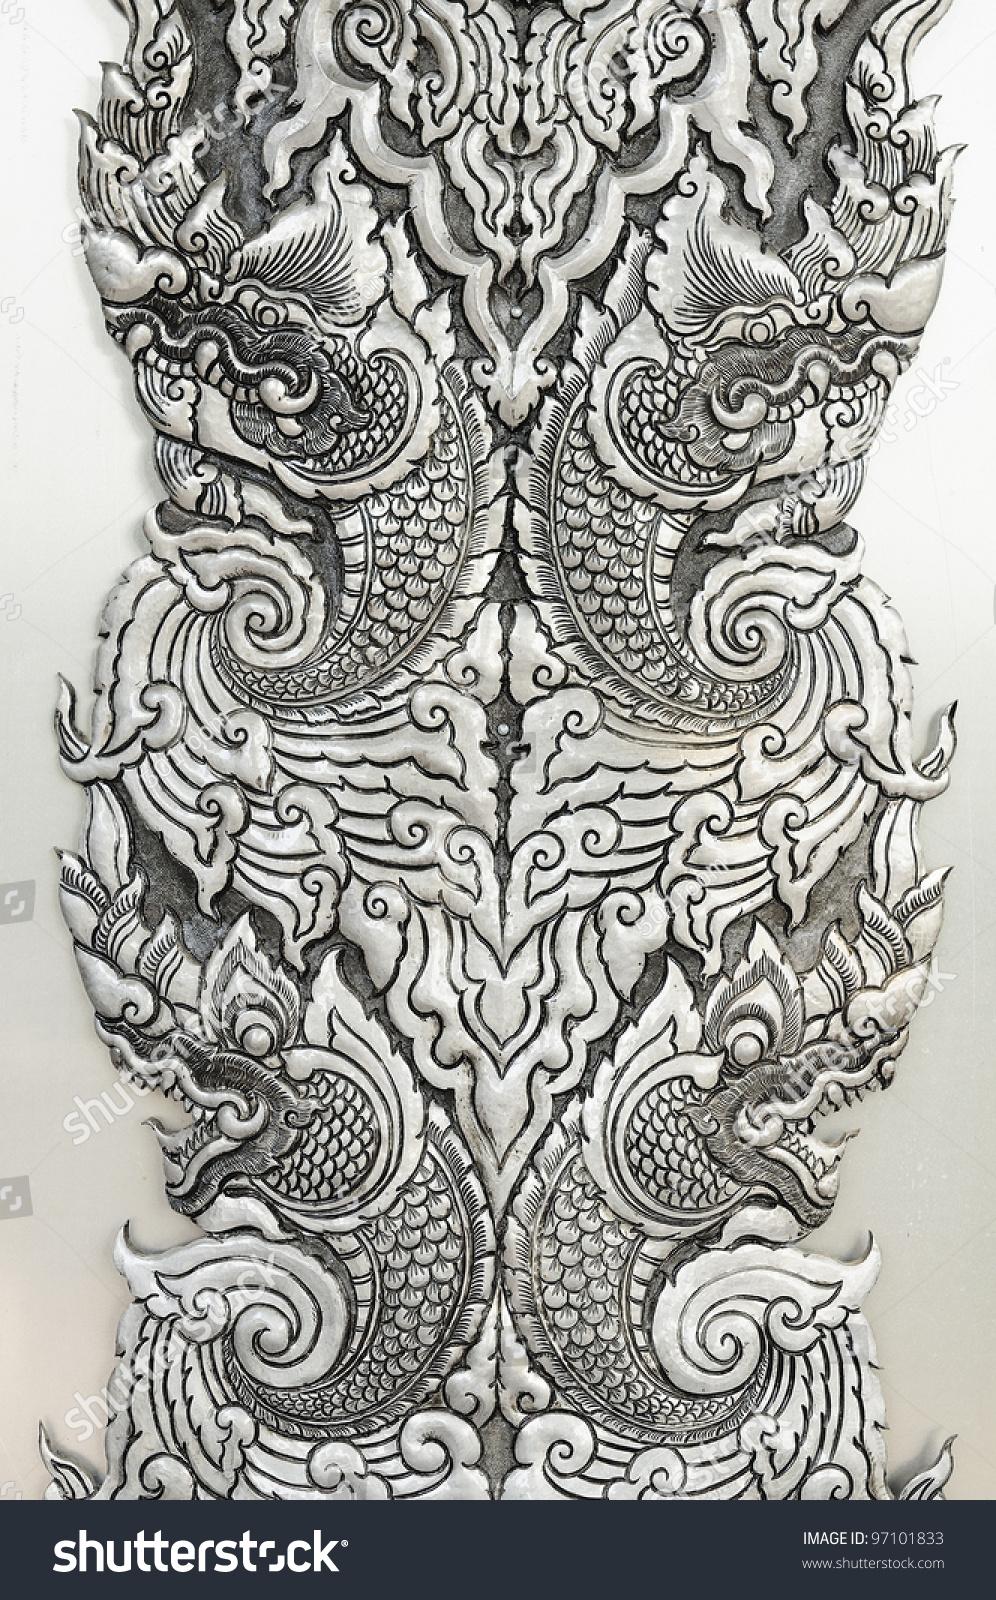 pattern decorative art of lanna thai engraving of the silver value - Decorative Art